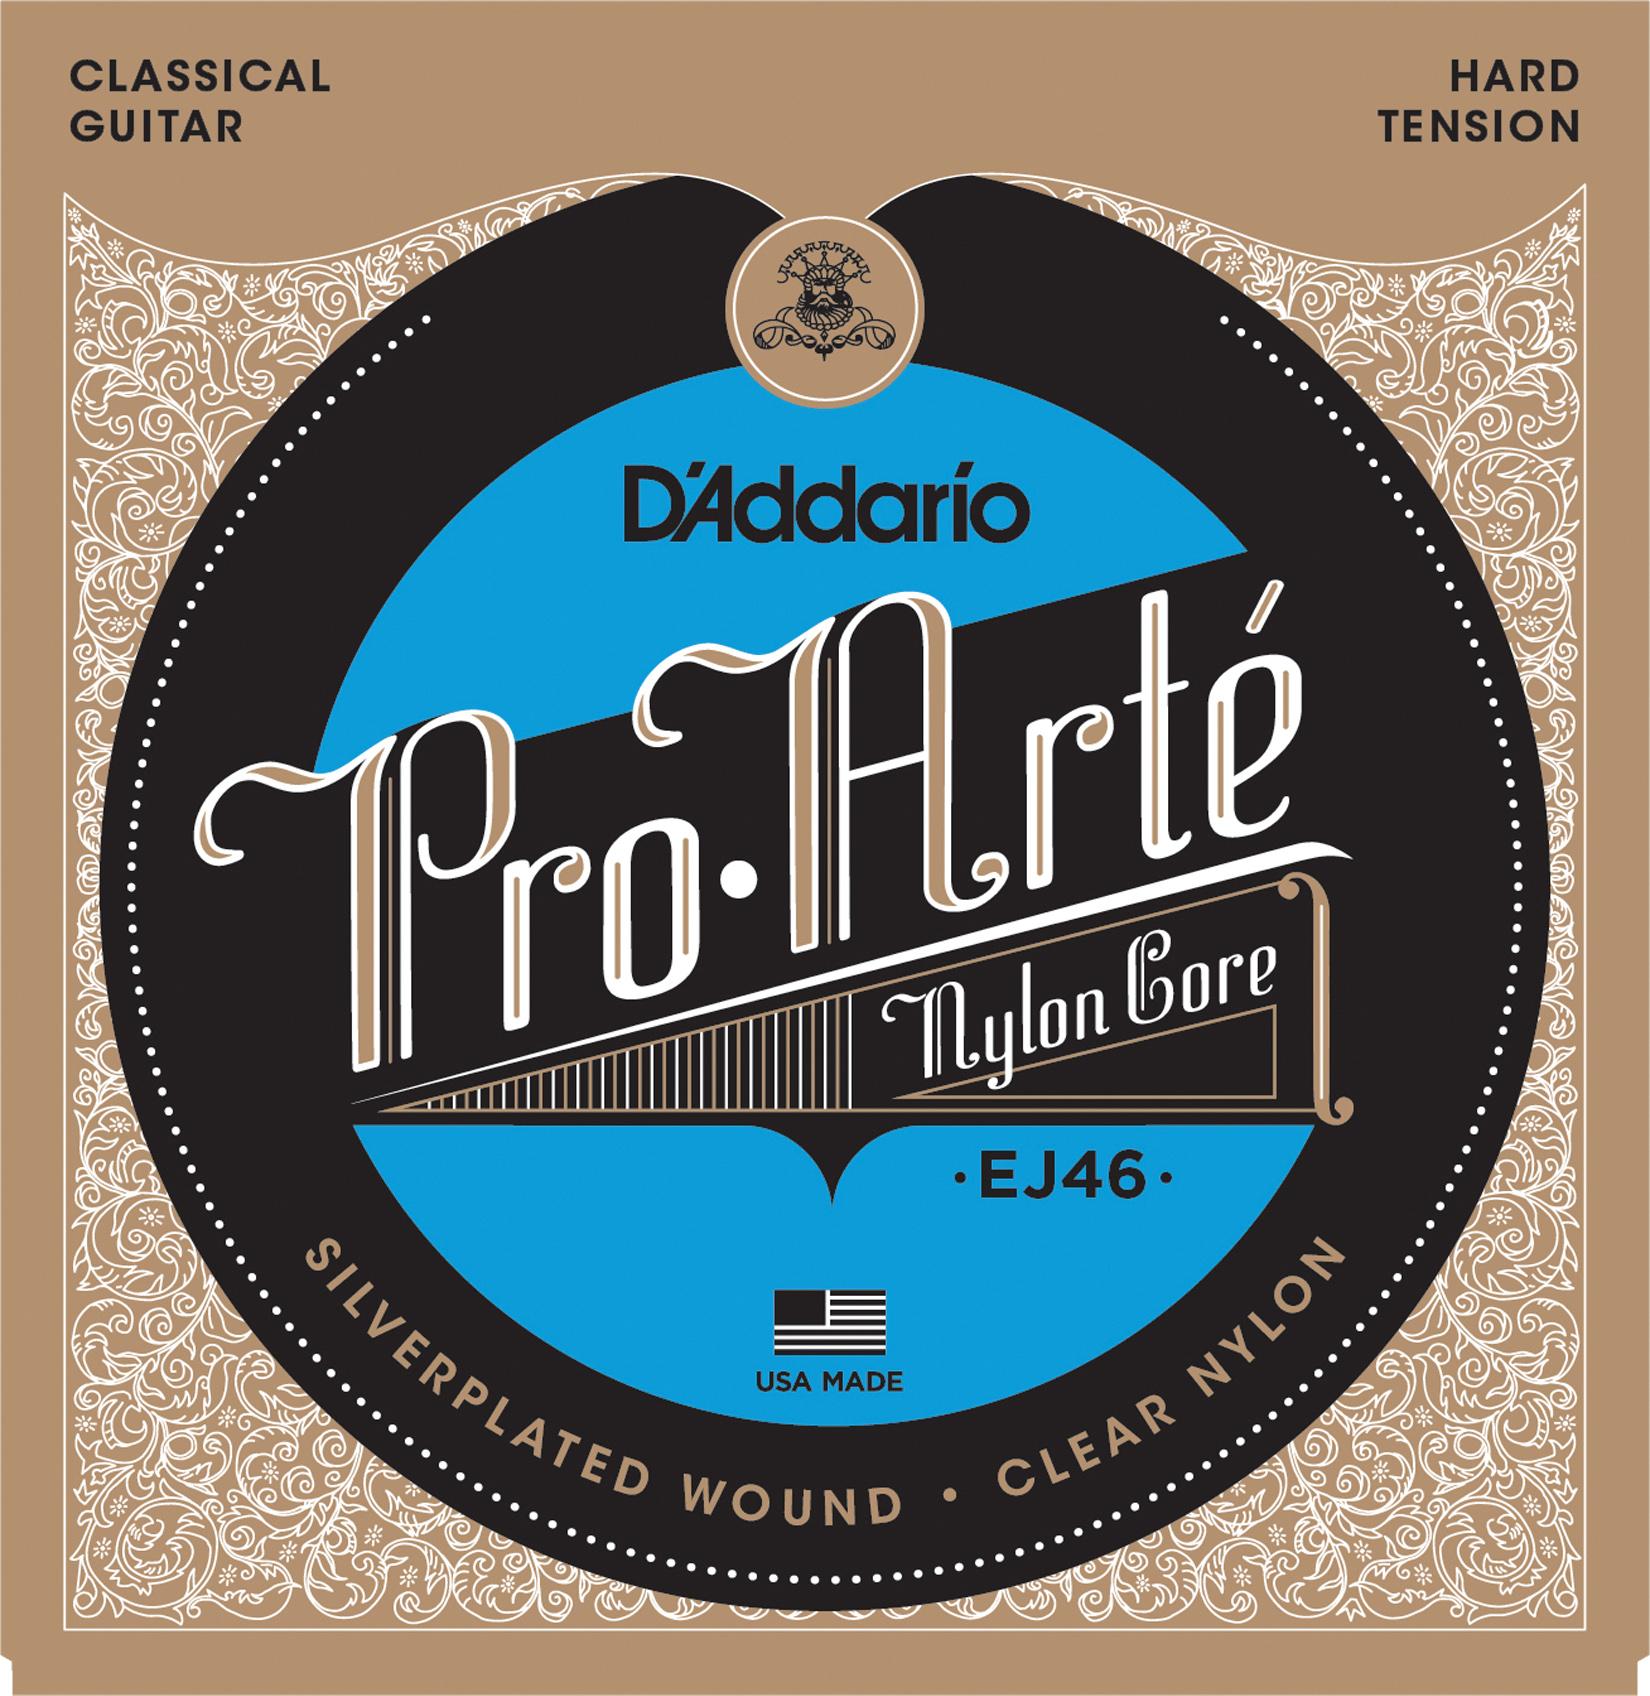 D'Addario Pro-Arte EJ46 Classical Guitar Strings, Hard Tension